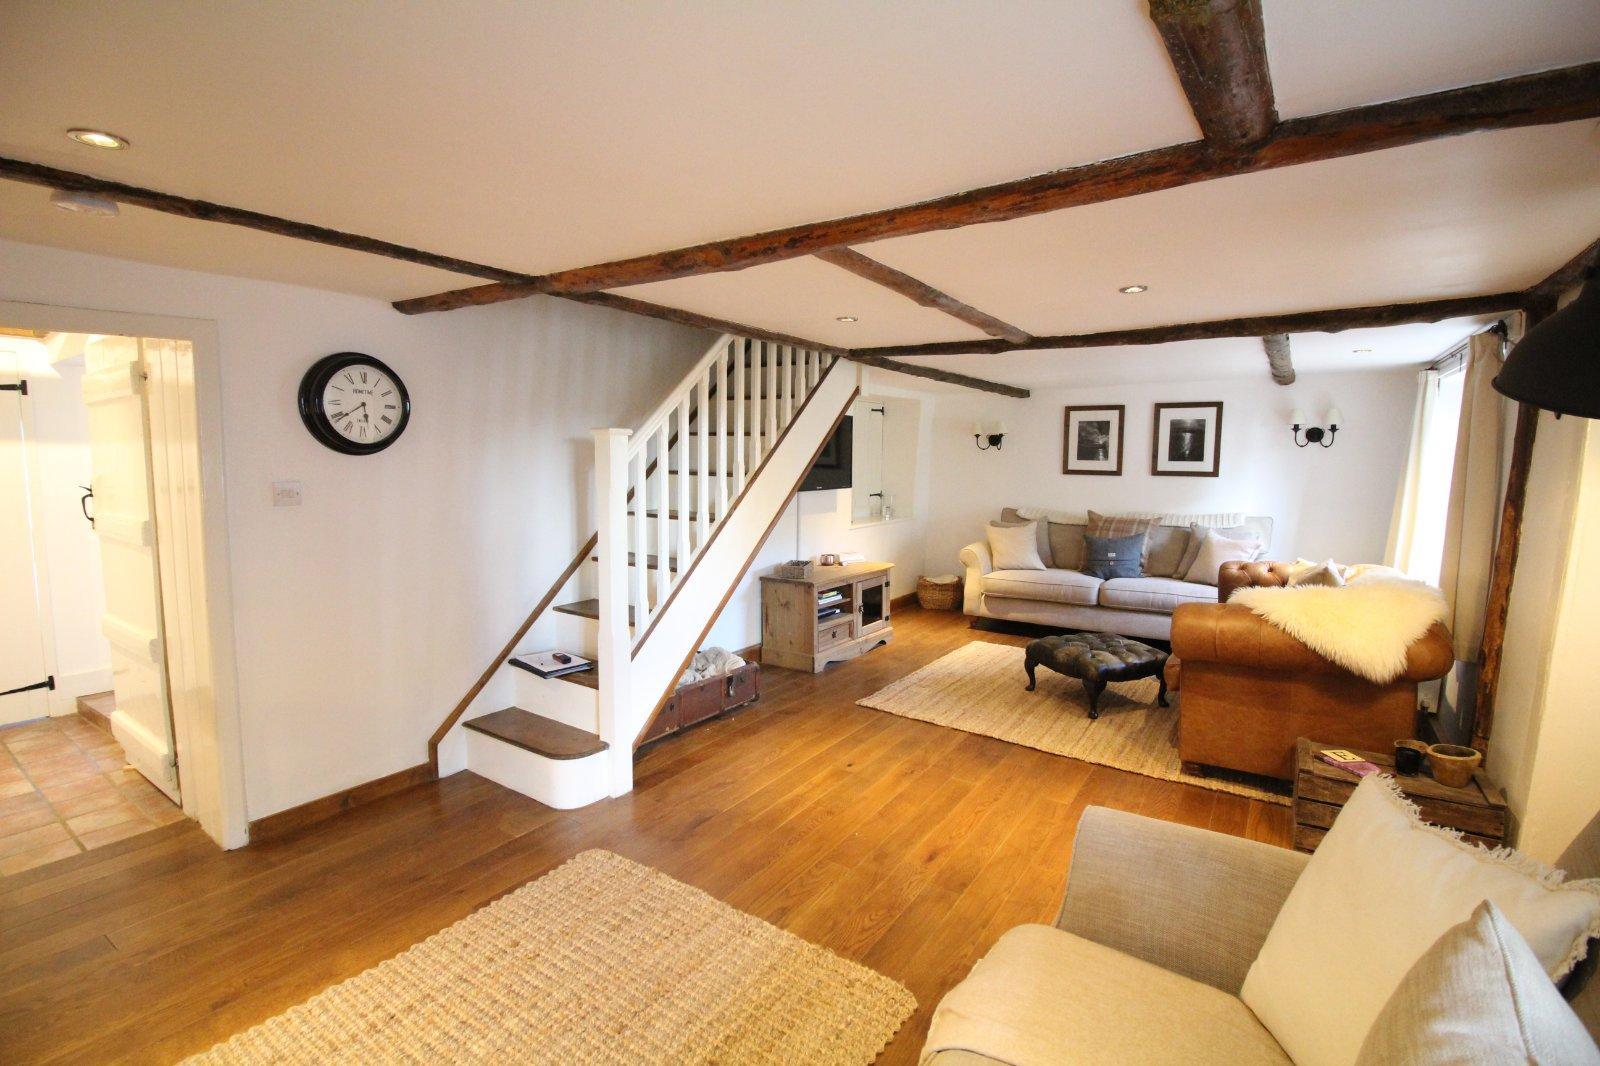 3 bed house to rent in Wareham Road, Lytchett Matravers 0